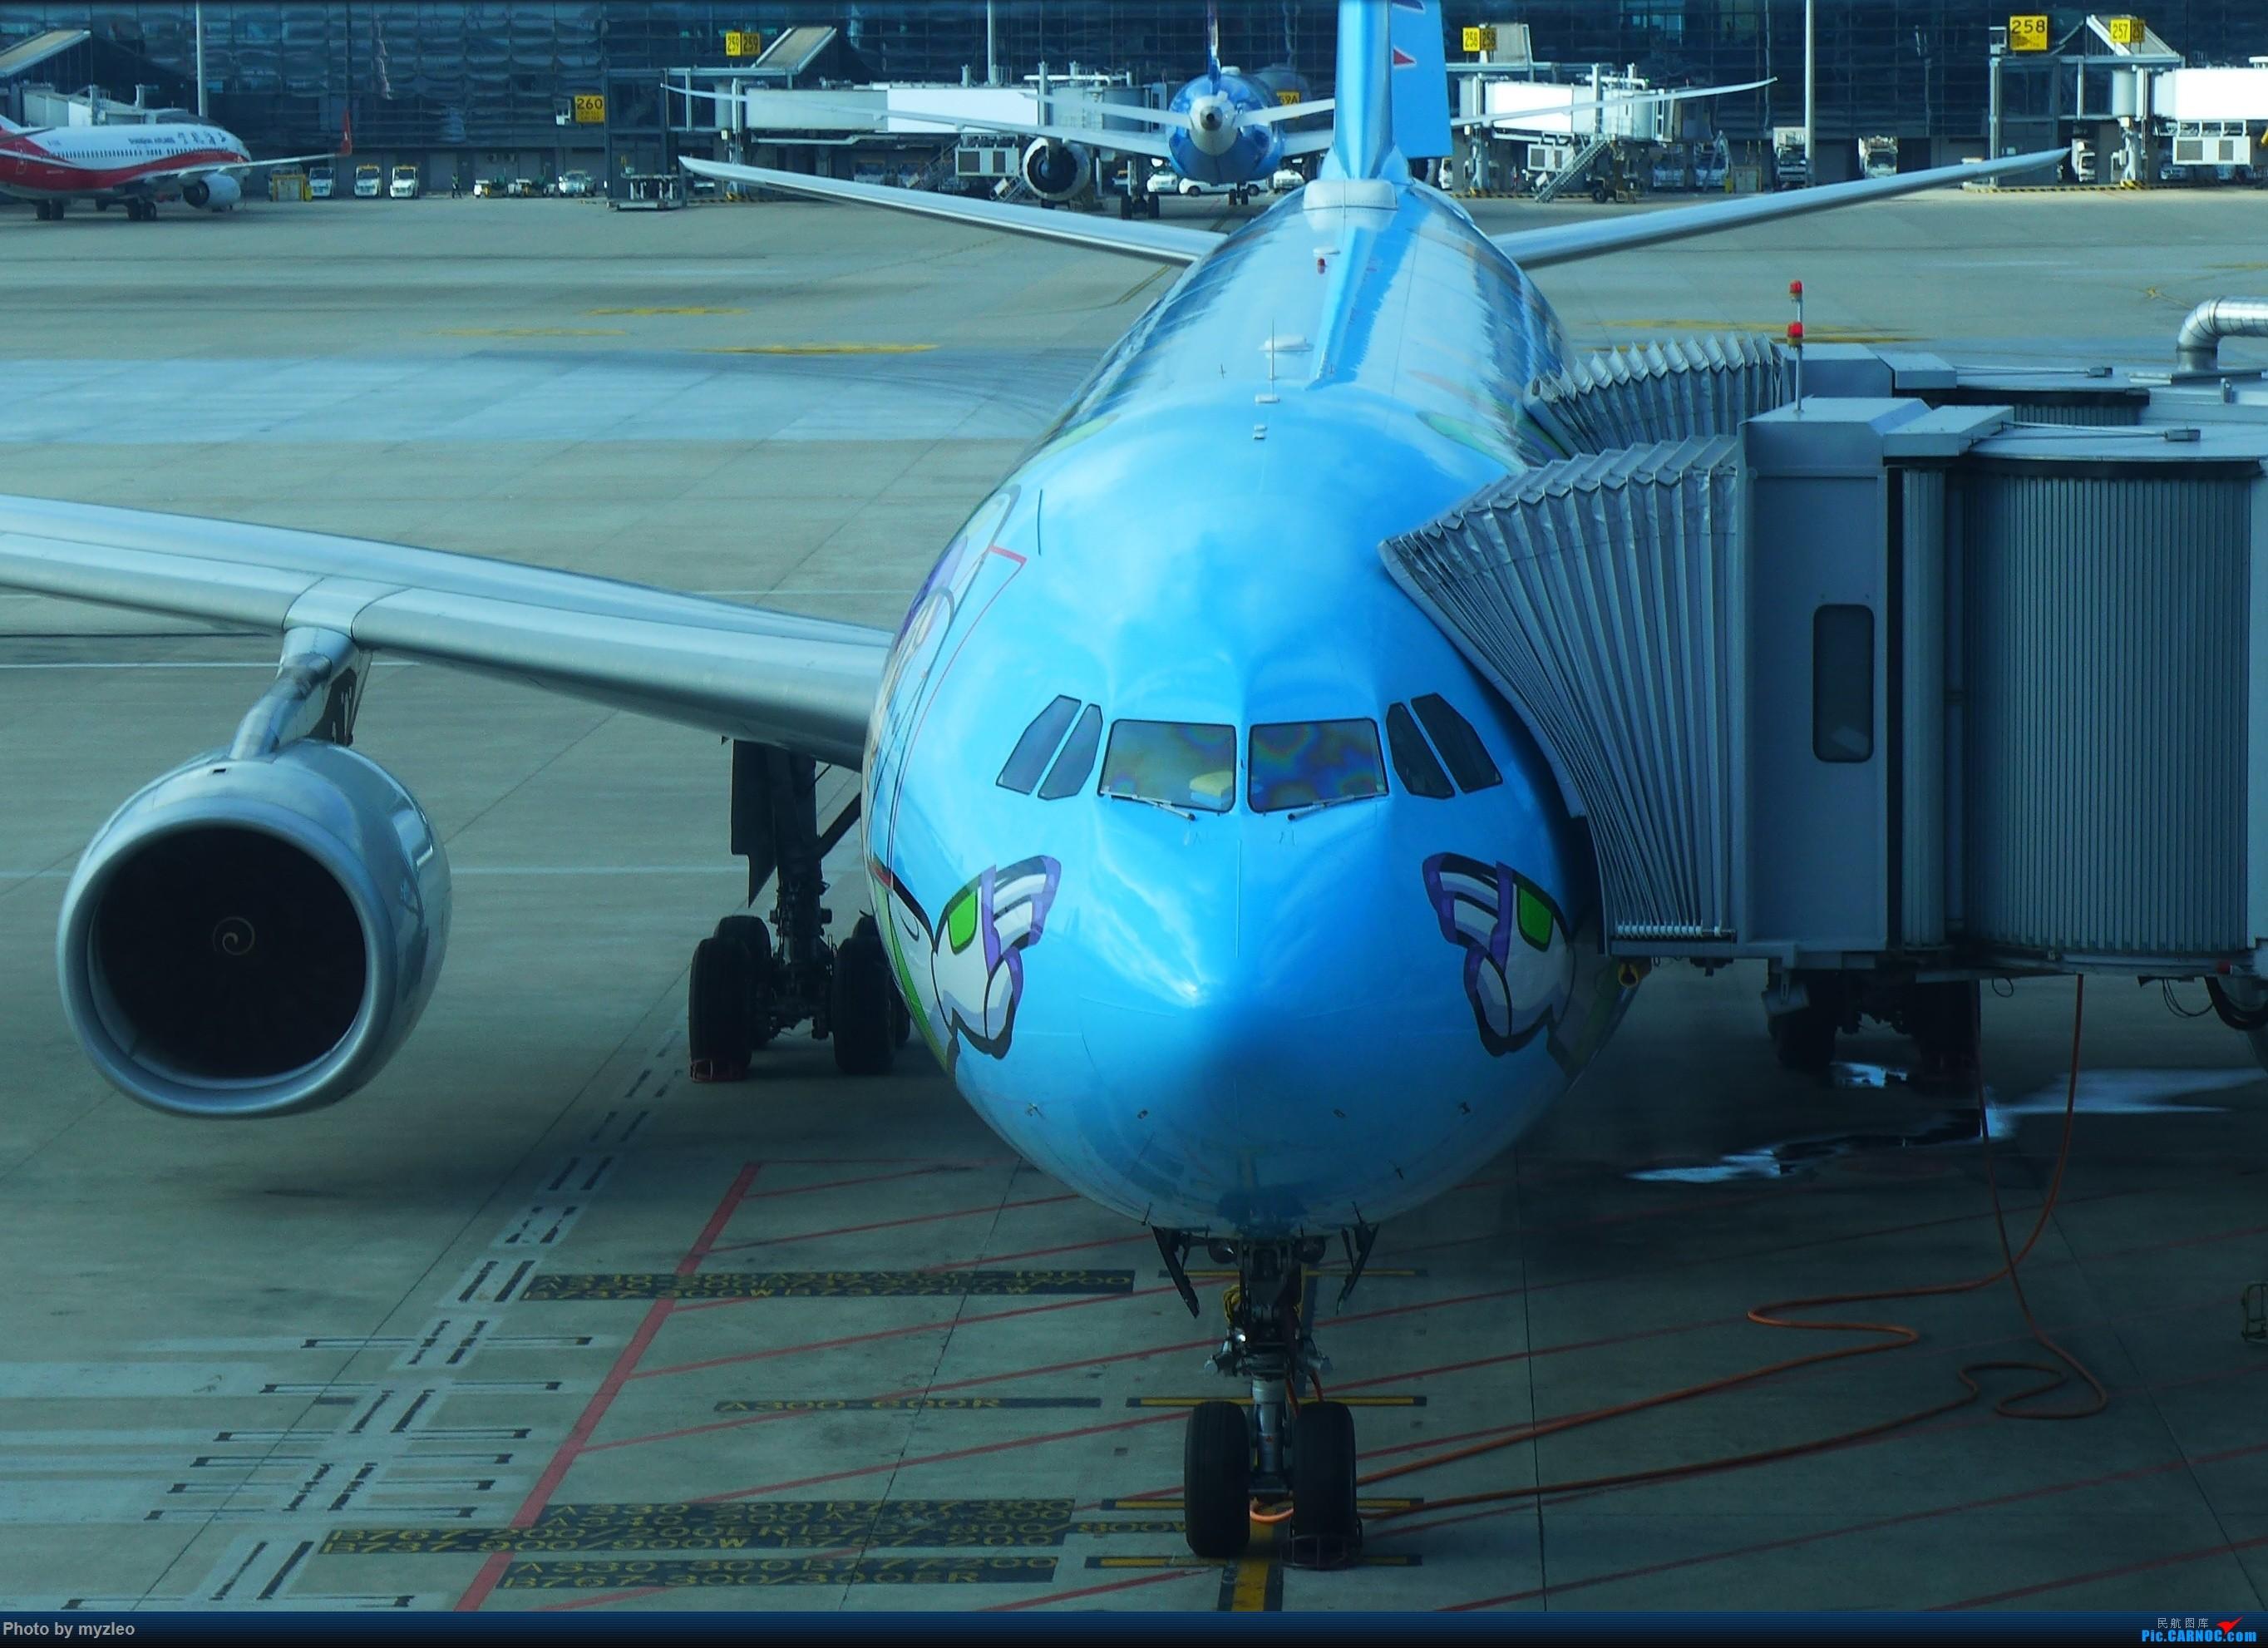 Re:[原创]【myzleo的游记2.1】昆洱风光(1)——SHA-KMG上航商务舱再体验+人在昆明 AIRBUS A330-300 B-5976 中国上海虹桥国际机场